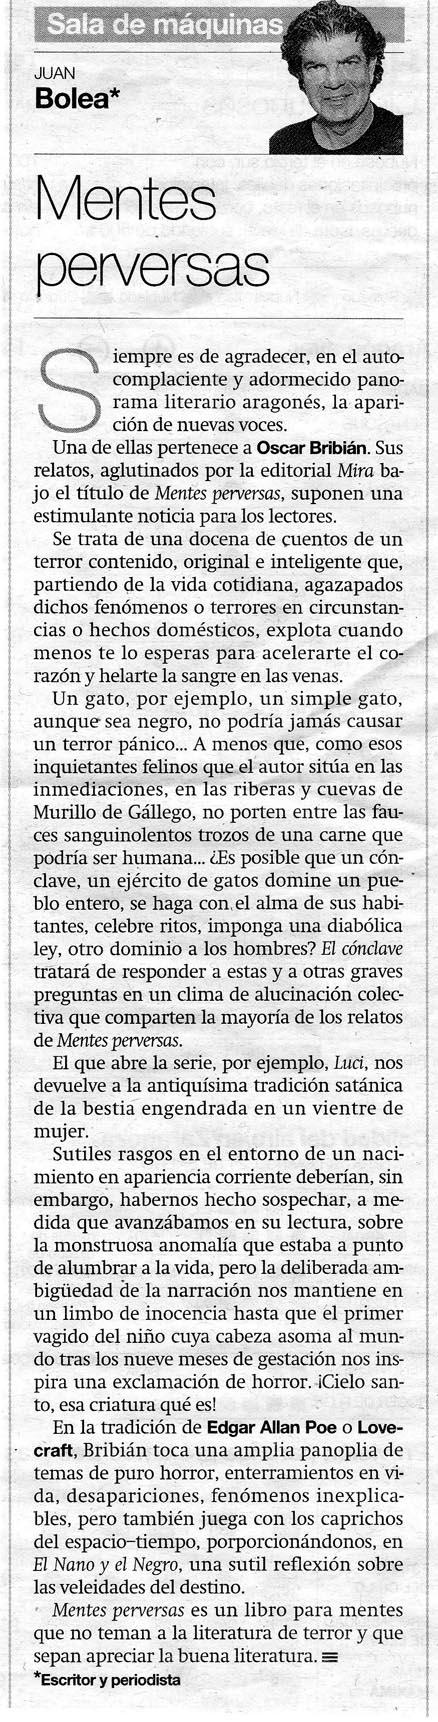 juan_bolea_periodico_enero2010 mentesperversas peque